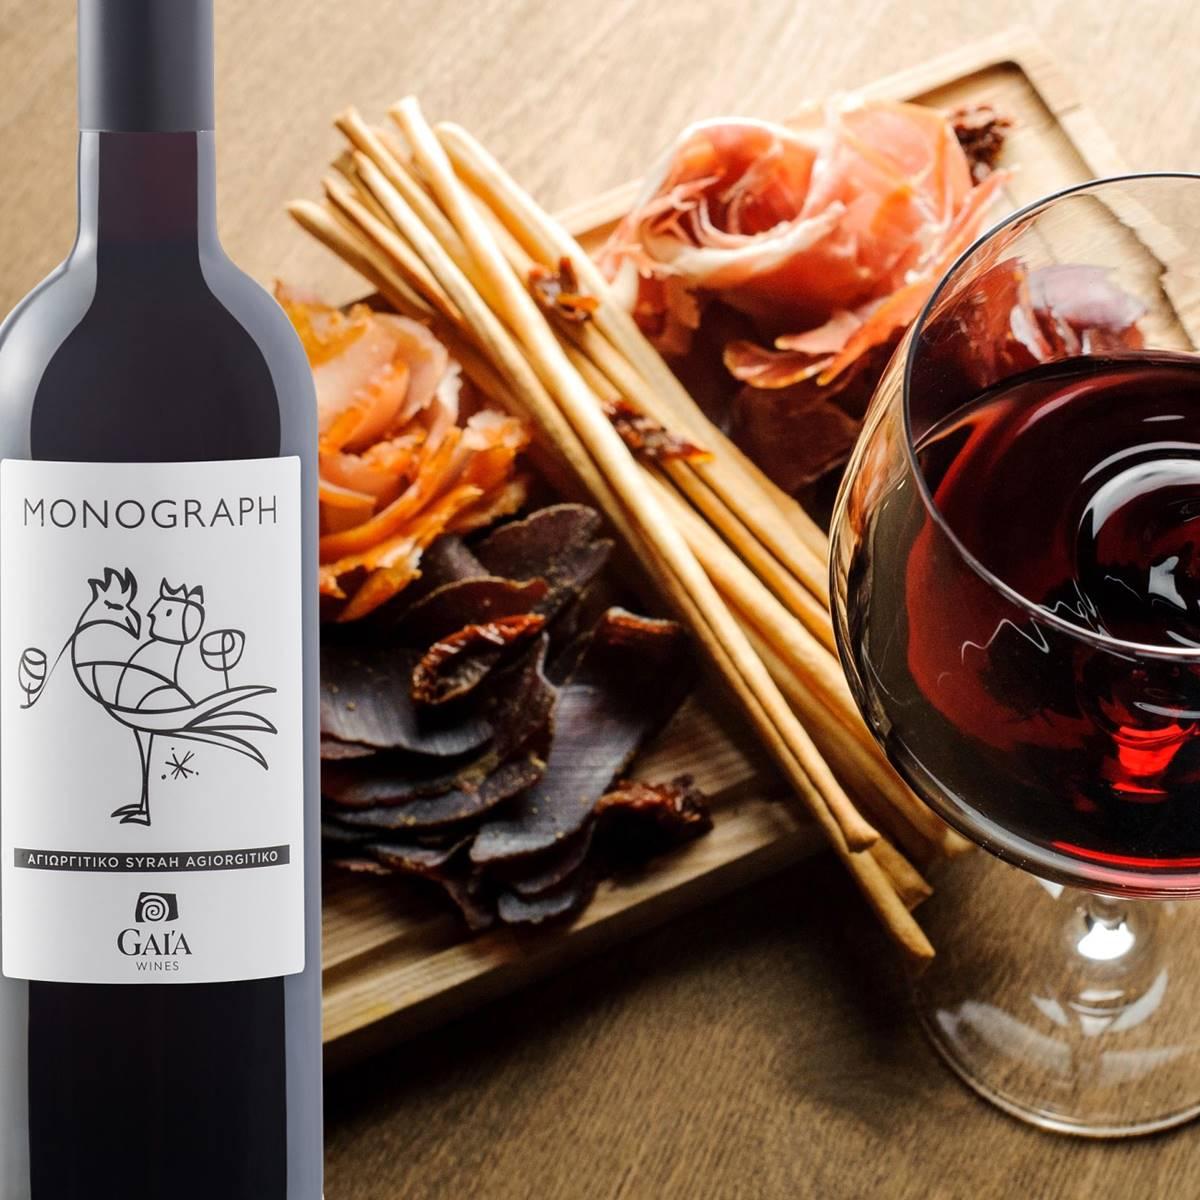 Wine Pairing Monograph Αγιωργίτικο Syrah, Κόκκινο - Gaia Wines